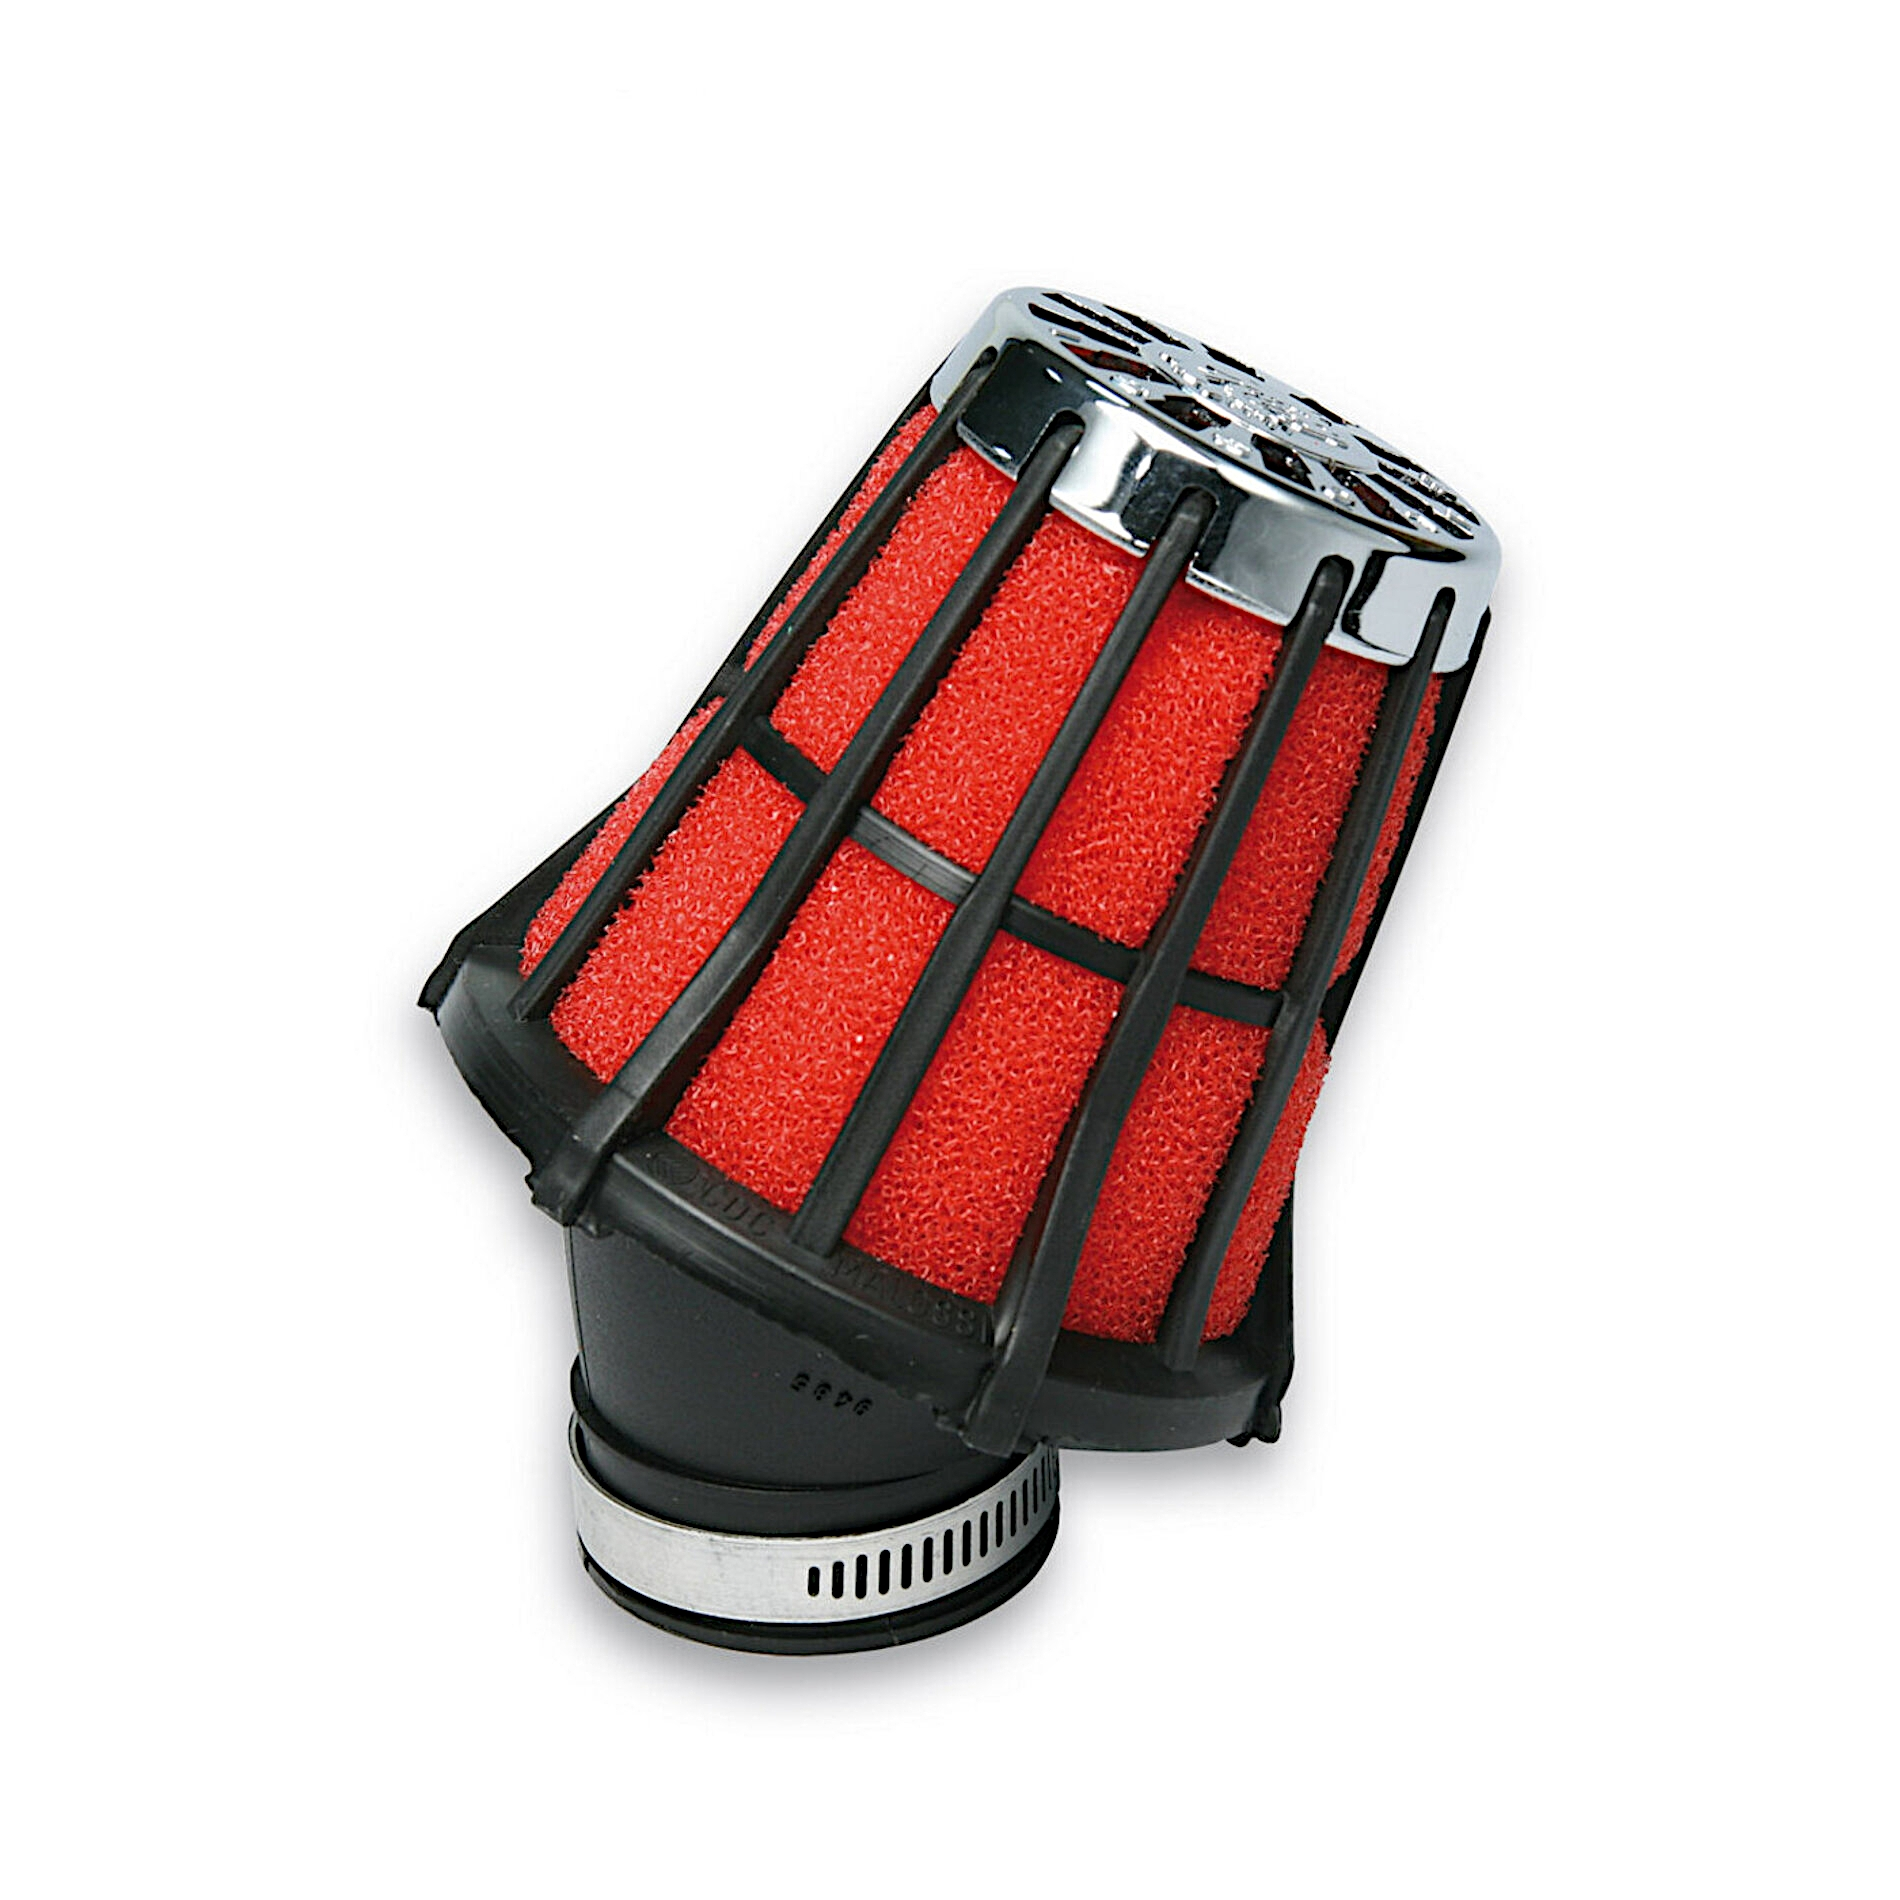 Filtre à air Malossi Red Filter E5 D.48 incliné 30